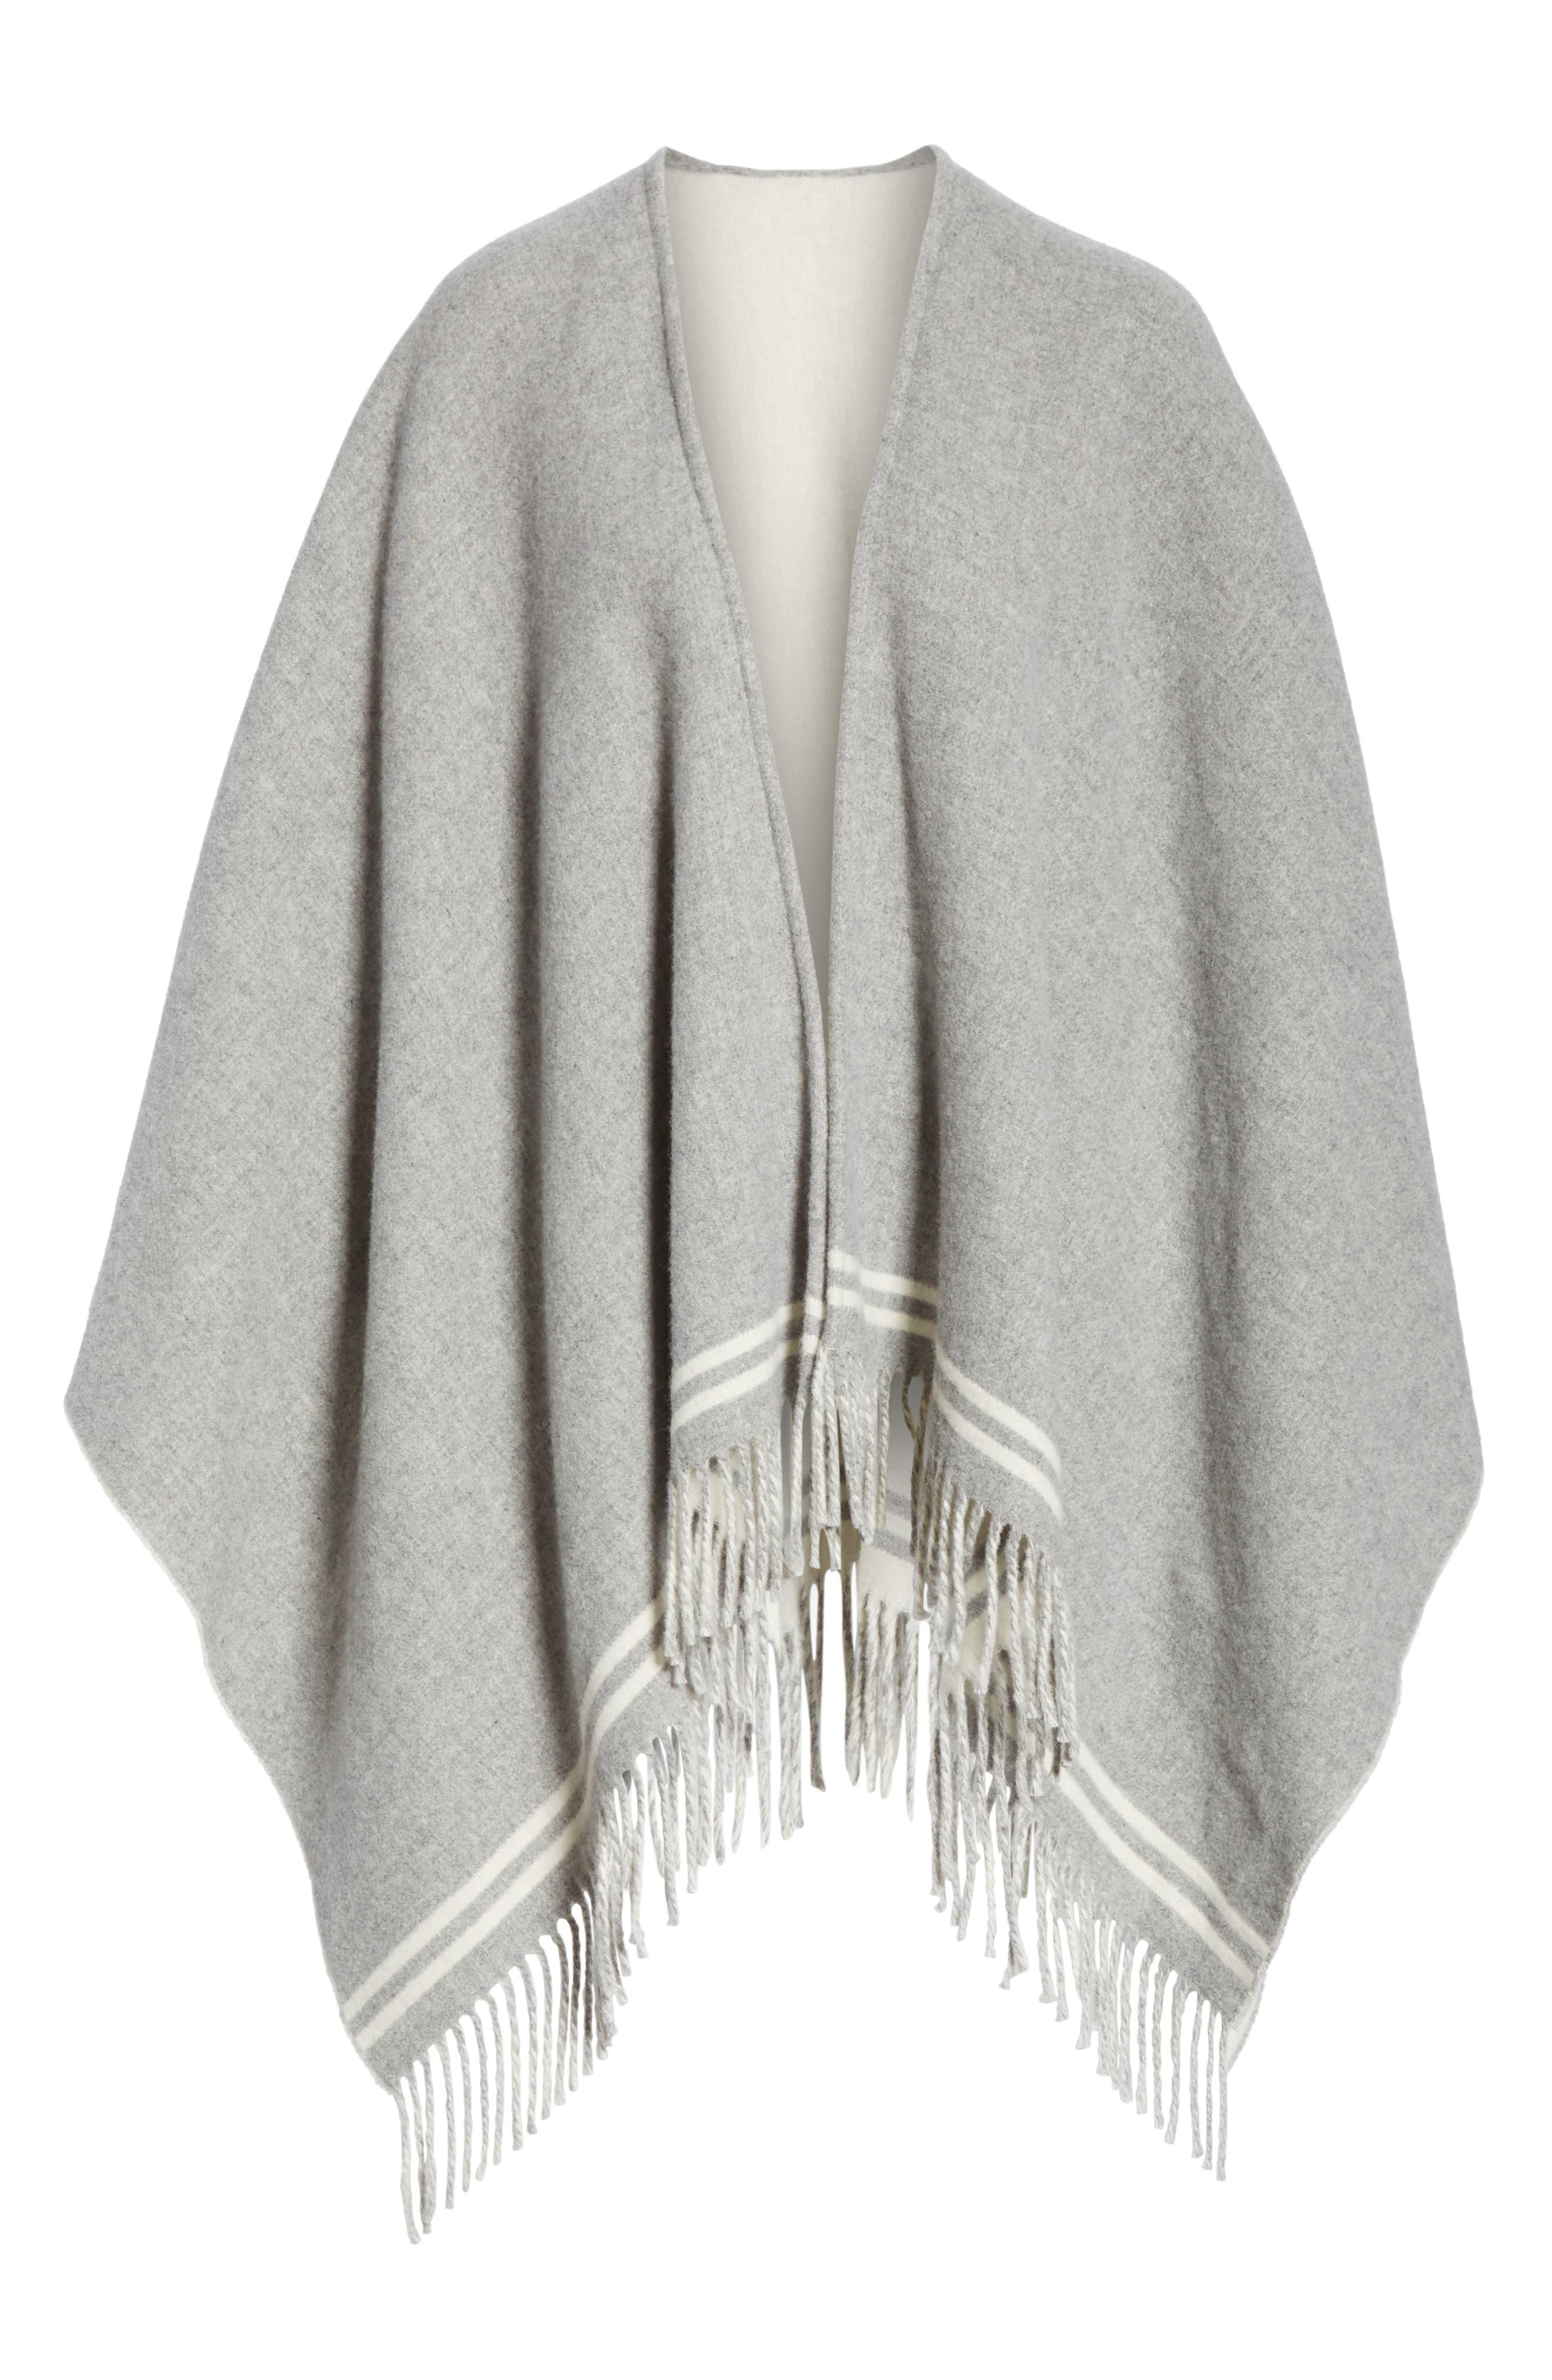 Stripe Merino Wool Poncho,                             Alternate thumbnail 6, color,                             GREY MULTI